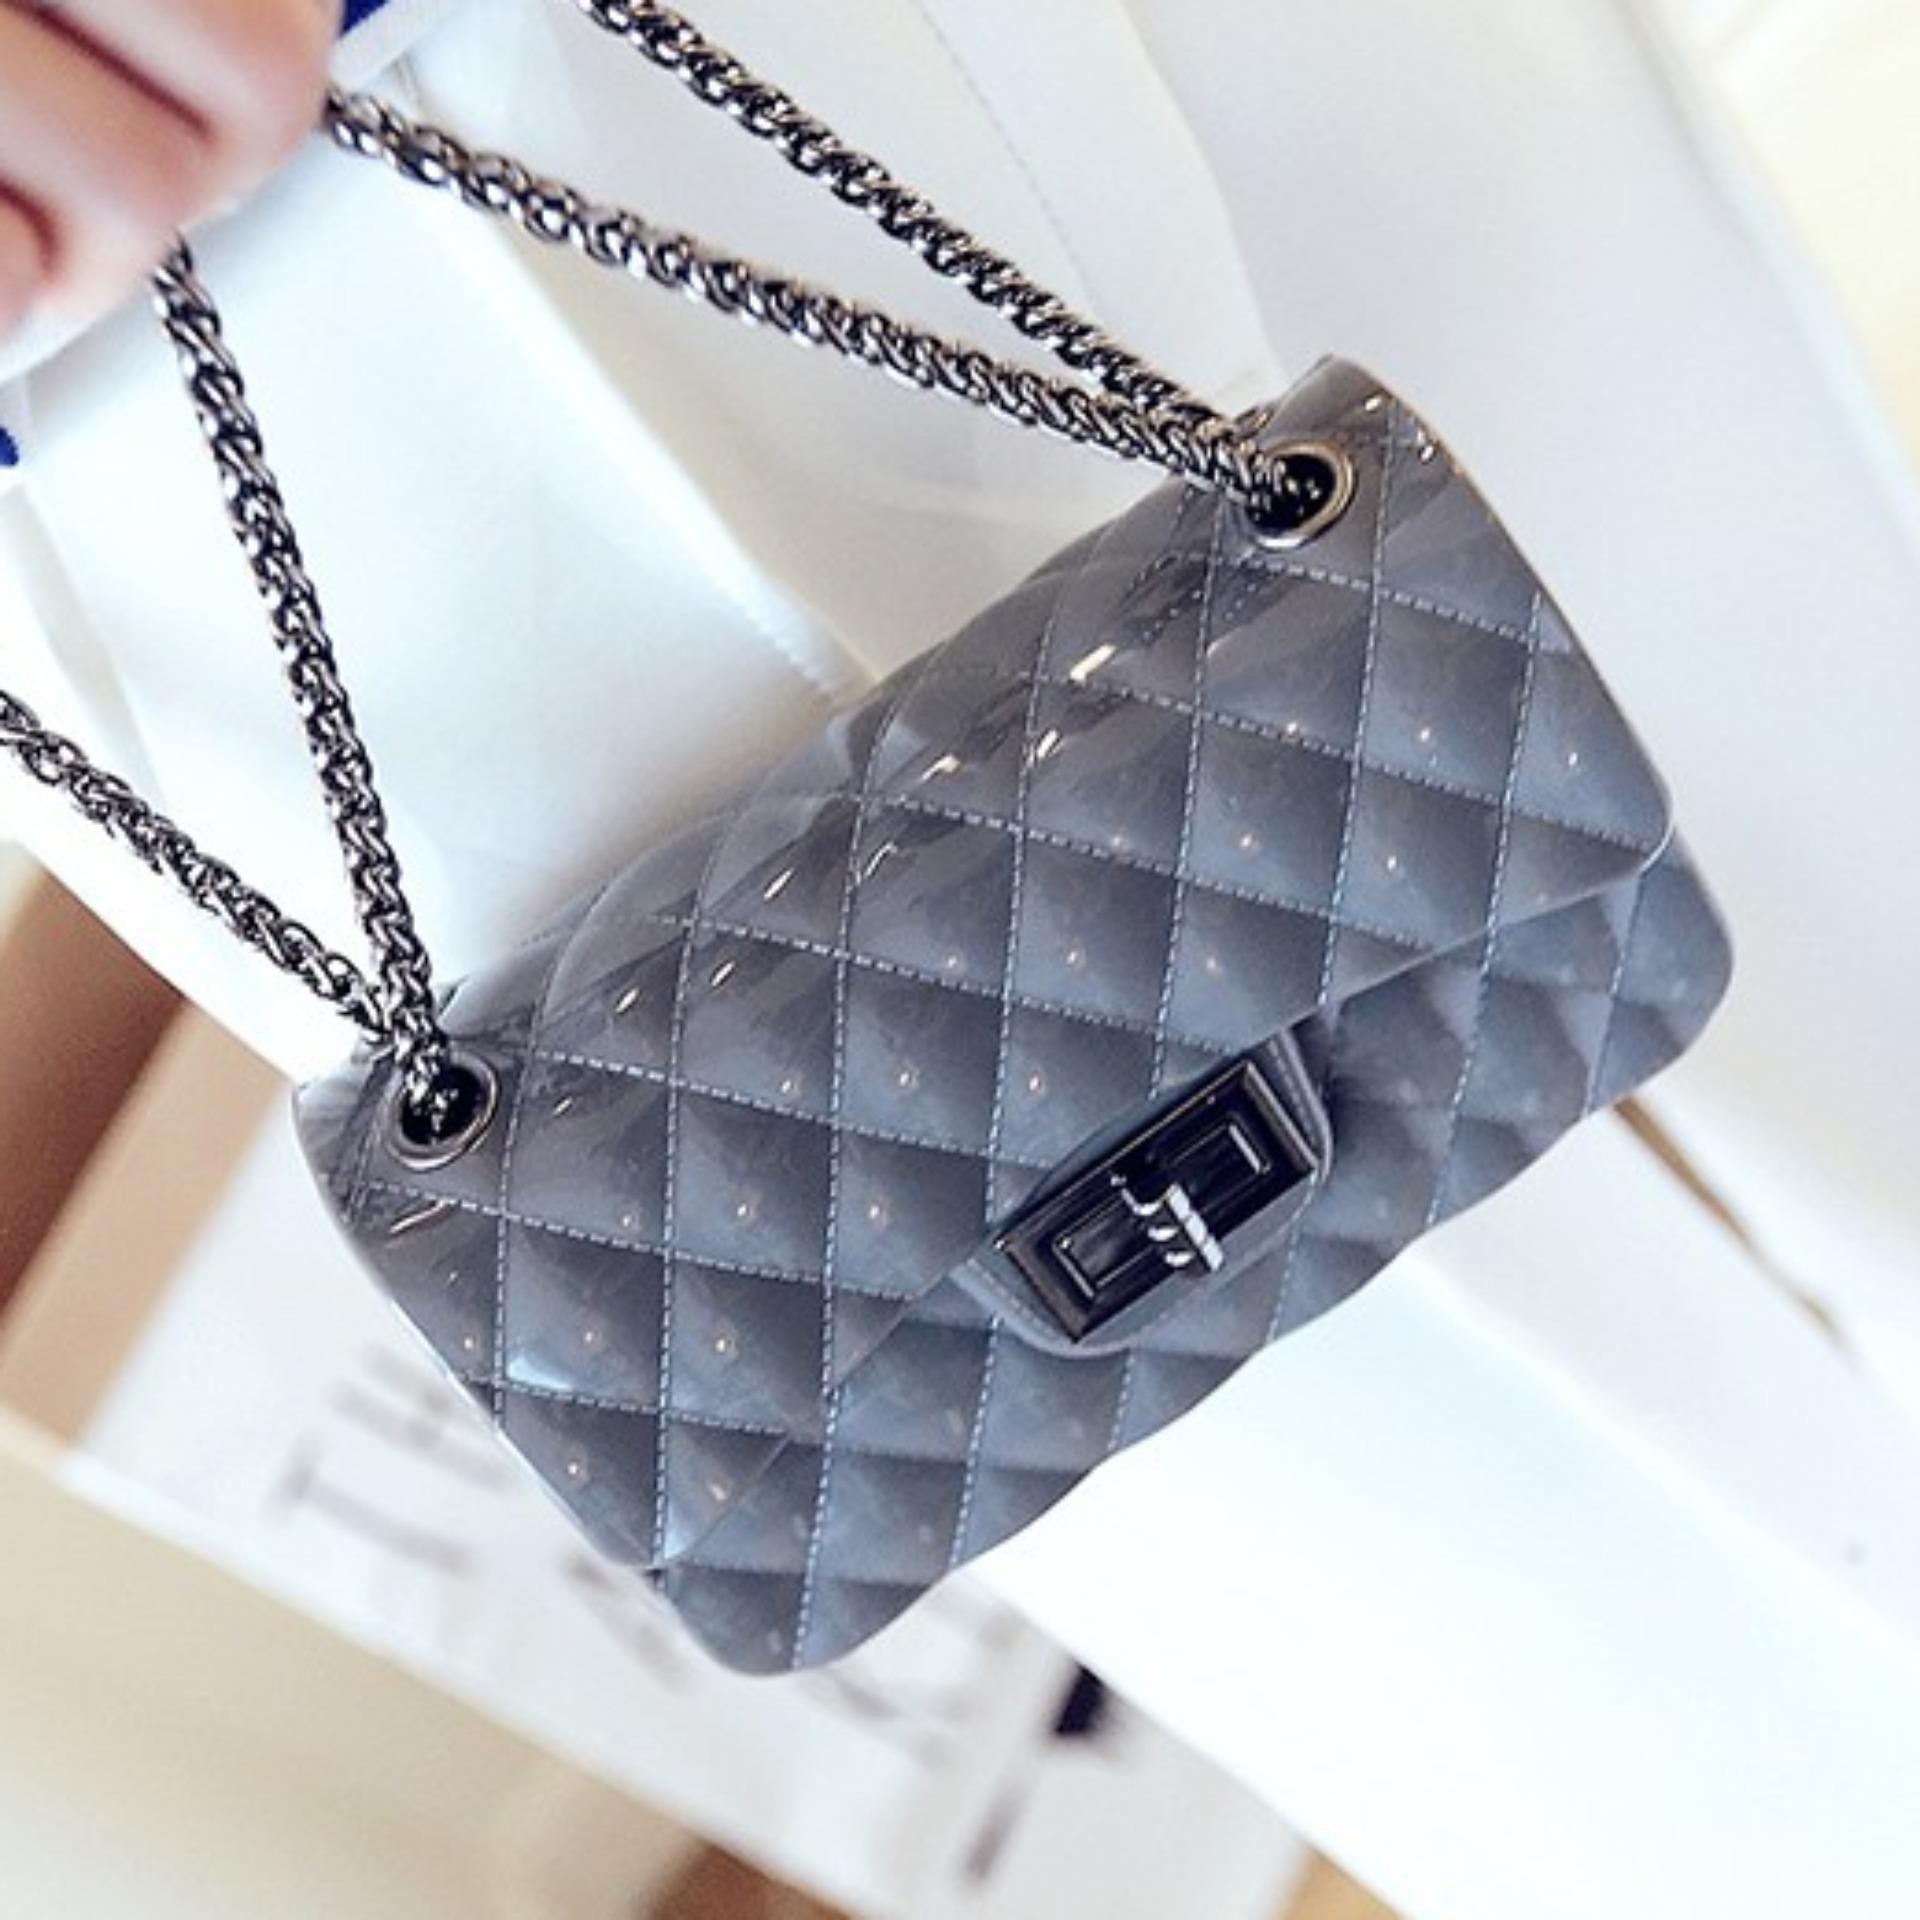 Tas Wanita Trendy Lestari Fashion HDSk450069 . Source · Louis - Tas Fashion Premium Jelly Silica